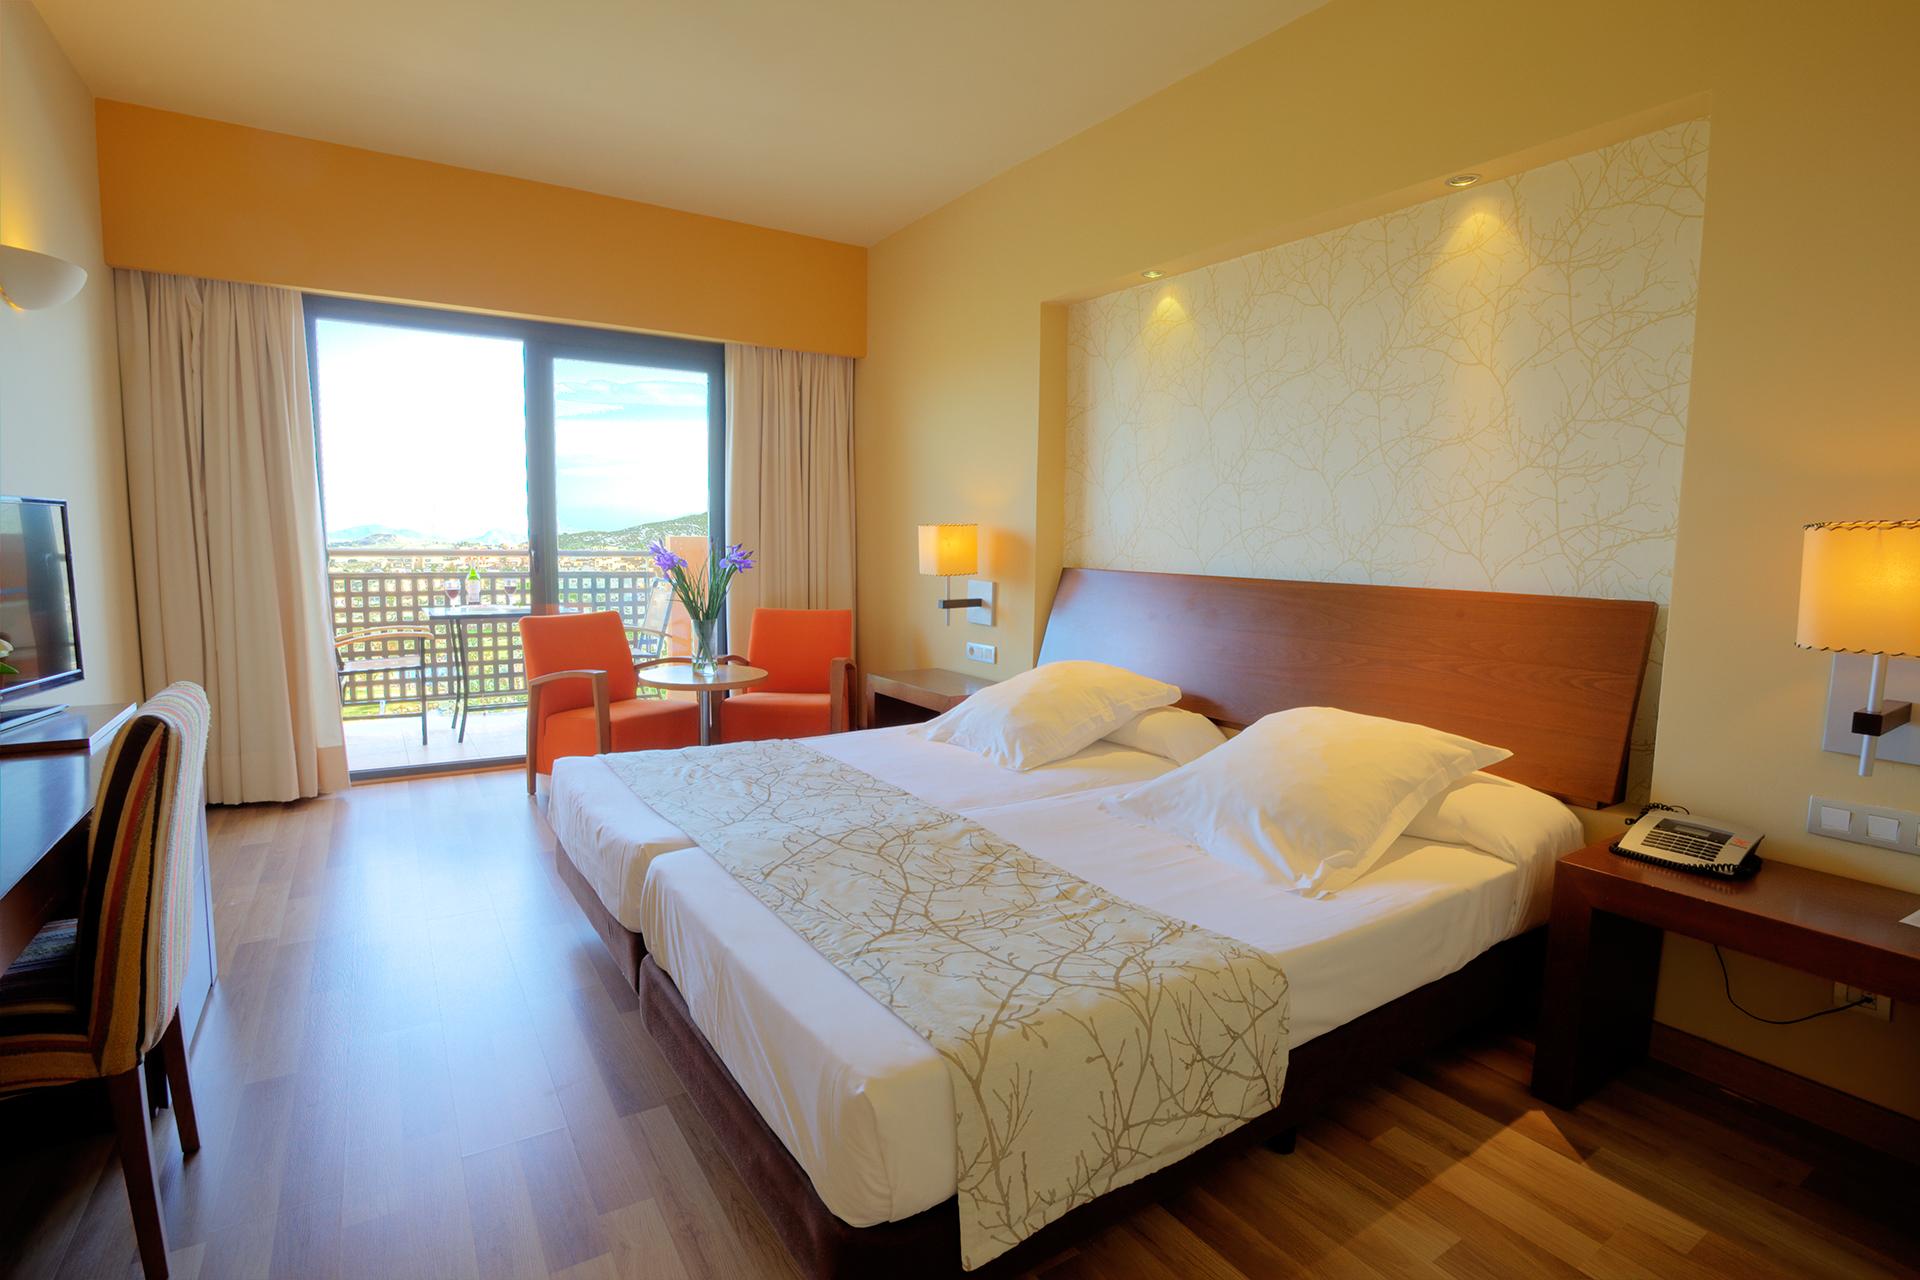 Golf-Expedition-Golf-reizen-Spanje-Regio-Valencia-Valle-Del-este-Golf-resort-Double-bedroom